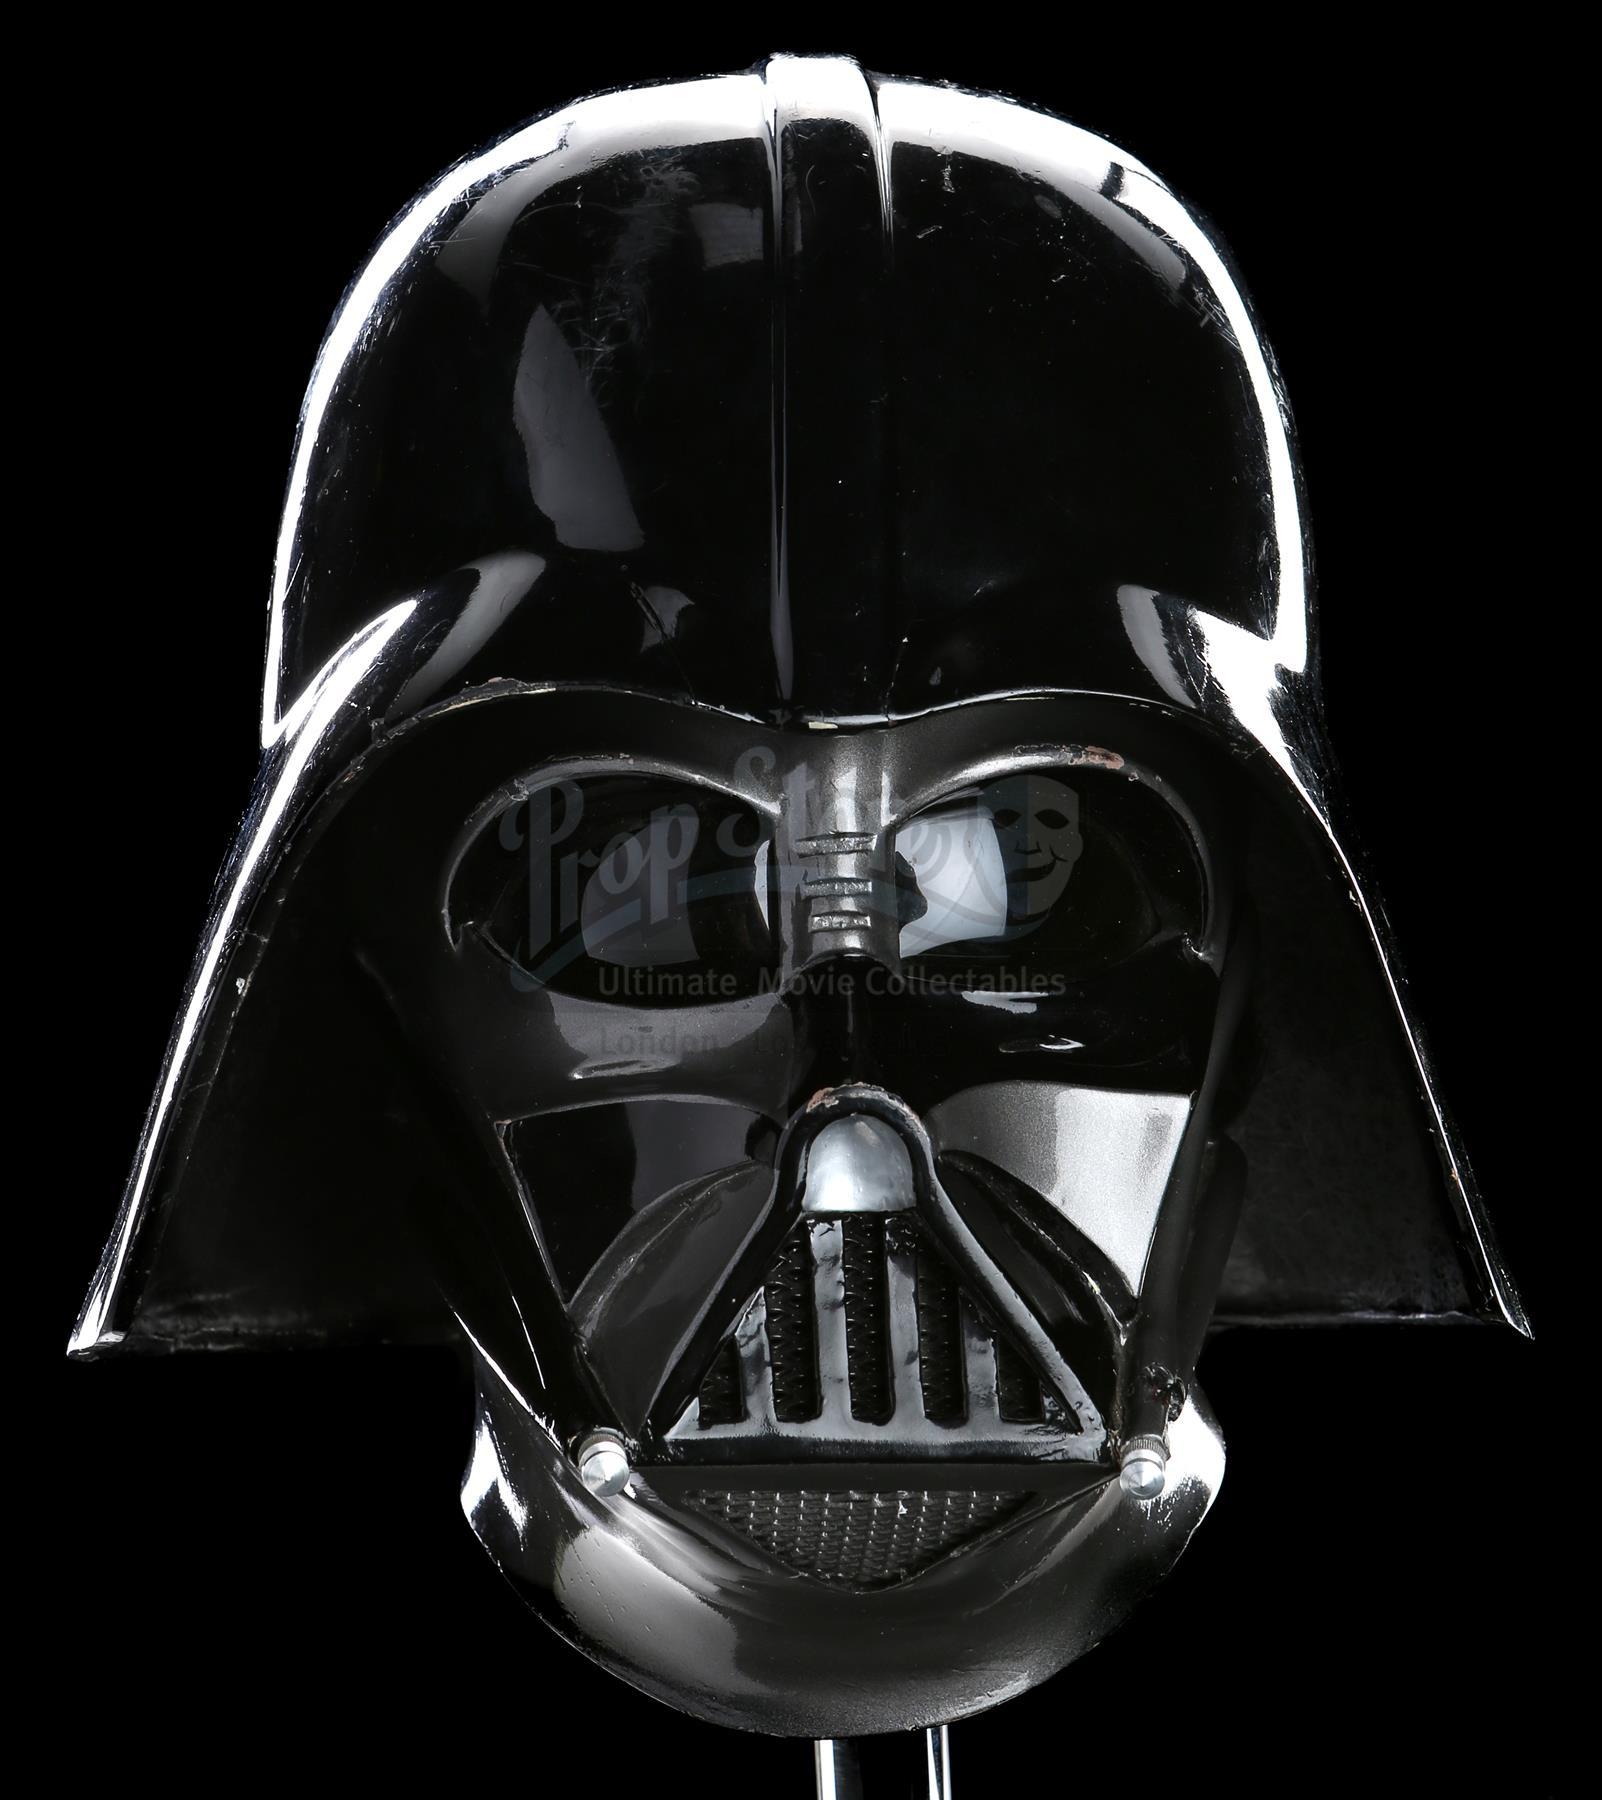 star wars the empire strikes back 1980 darth vader promotional